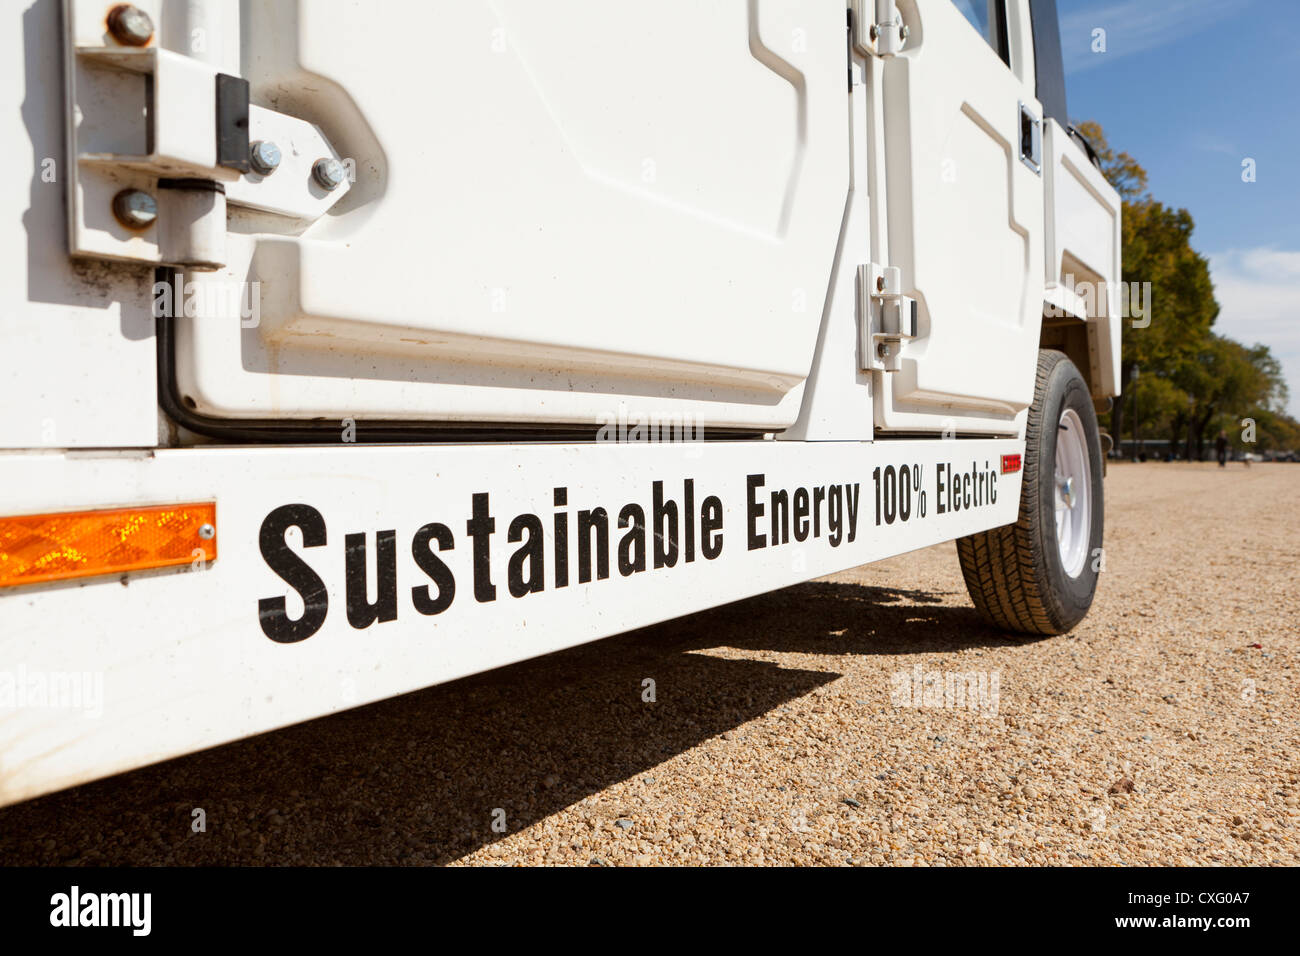 US Government electric utility car - Washington, DC USA - Stock Image